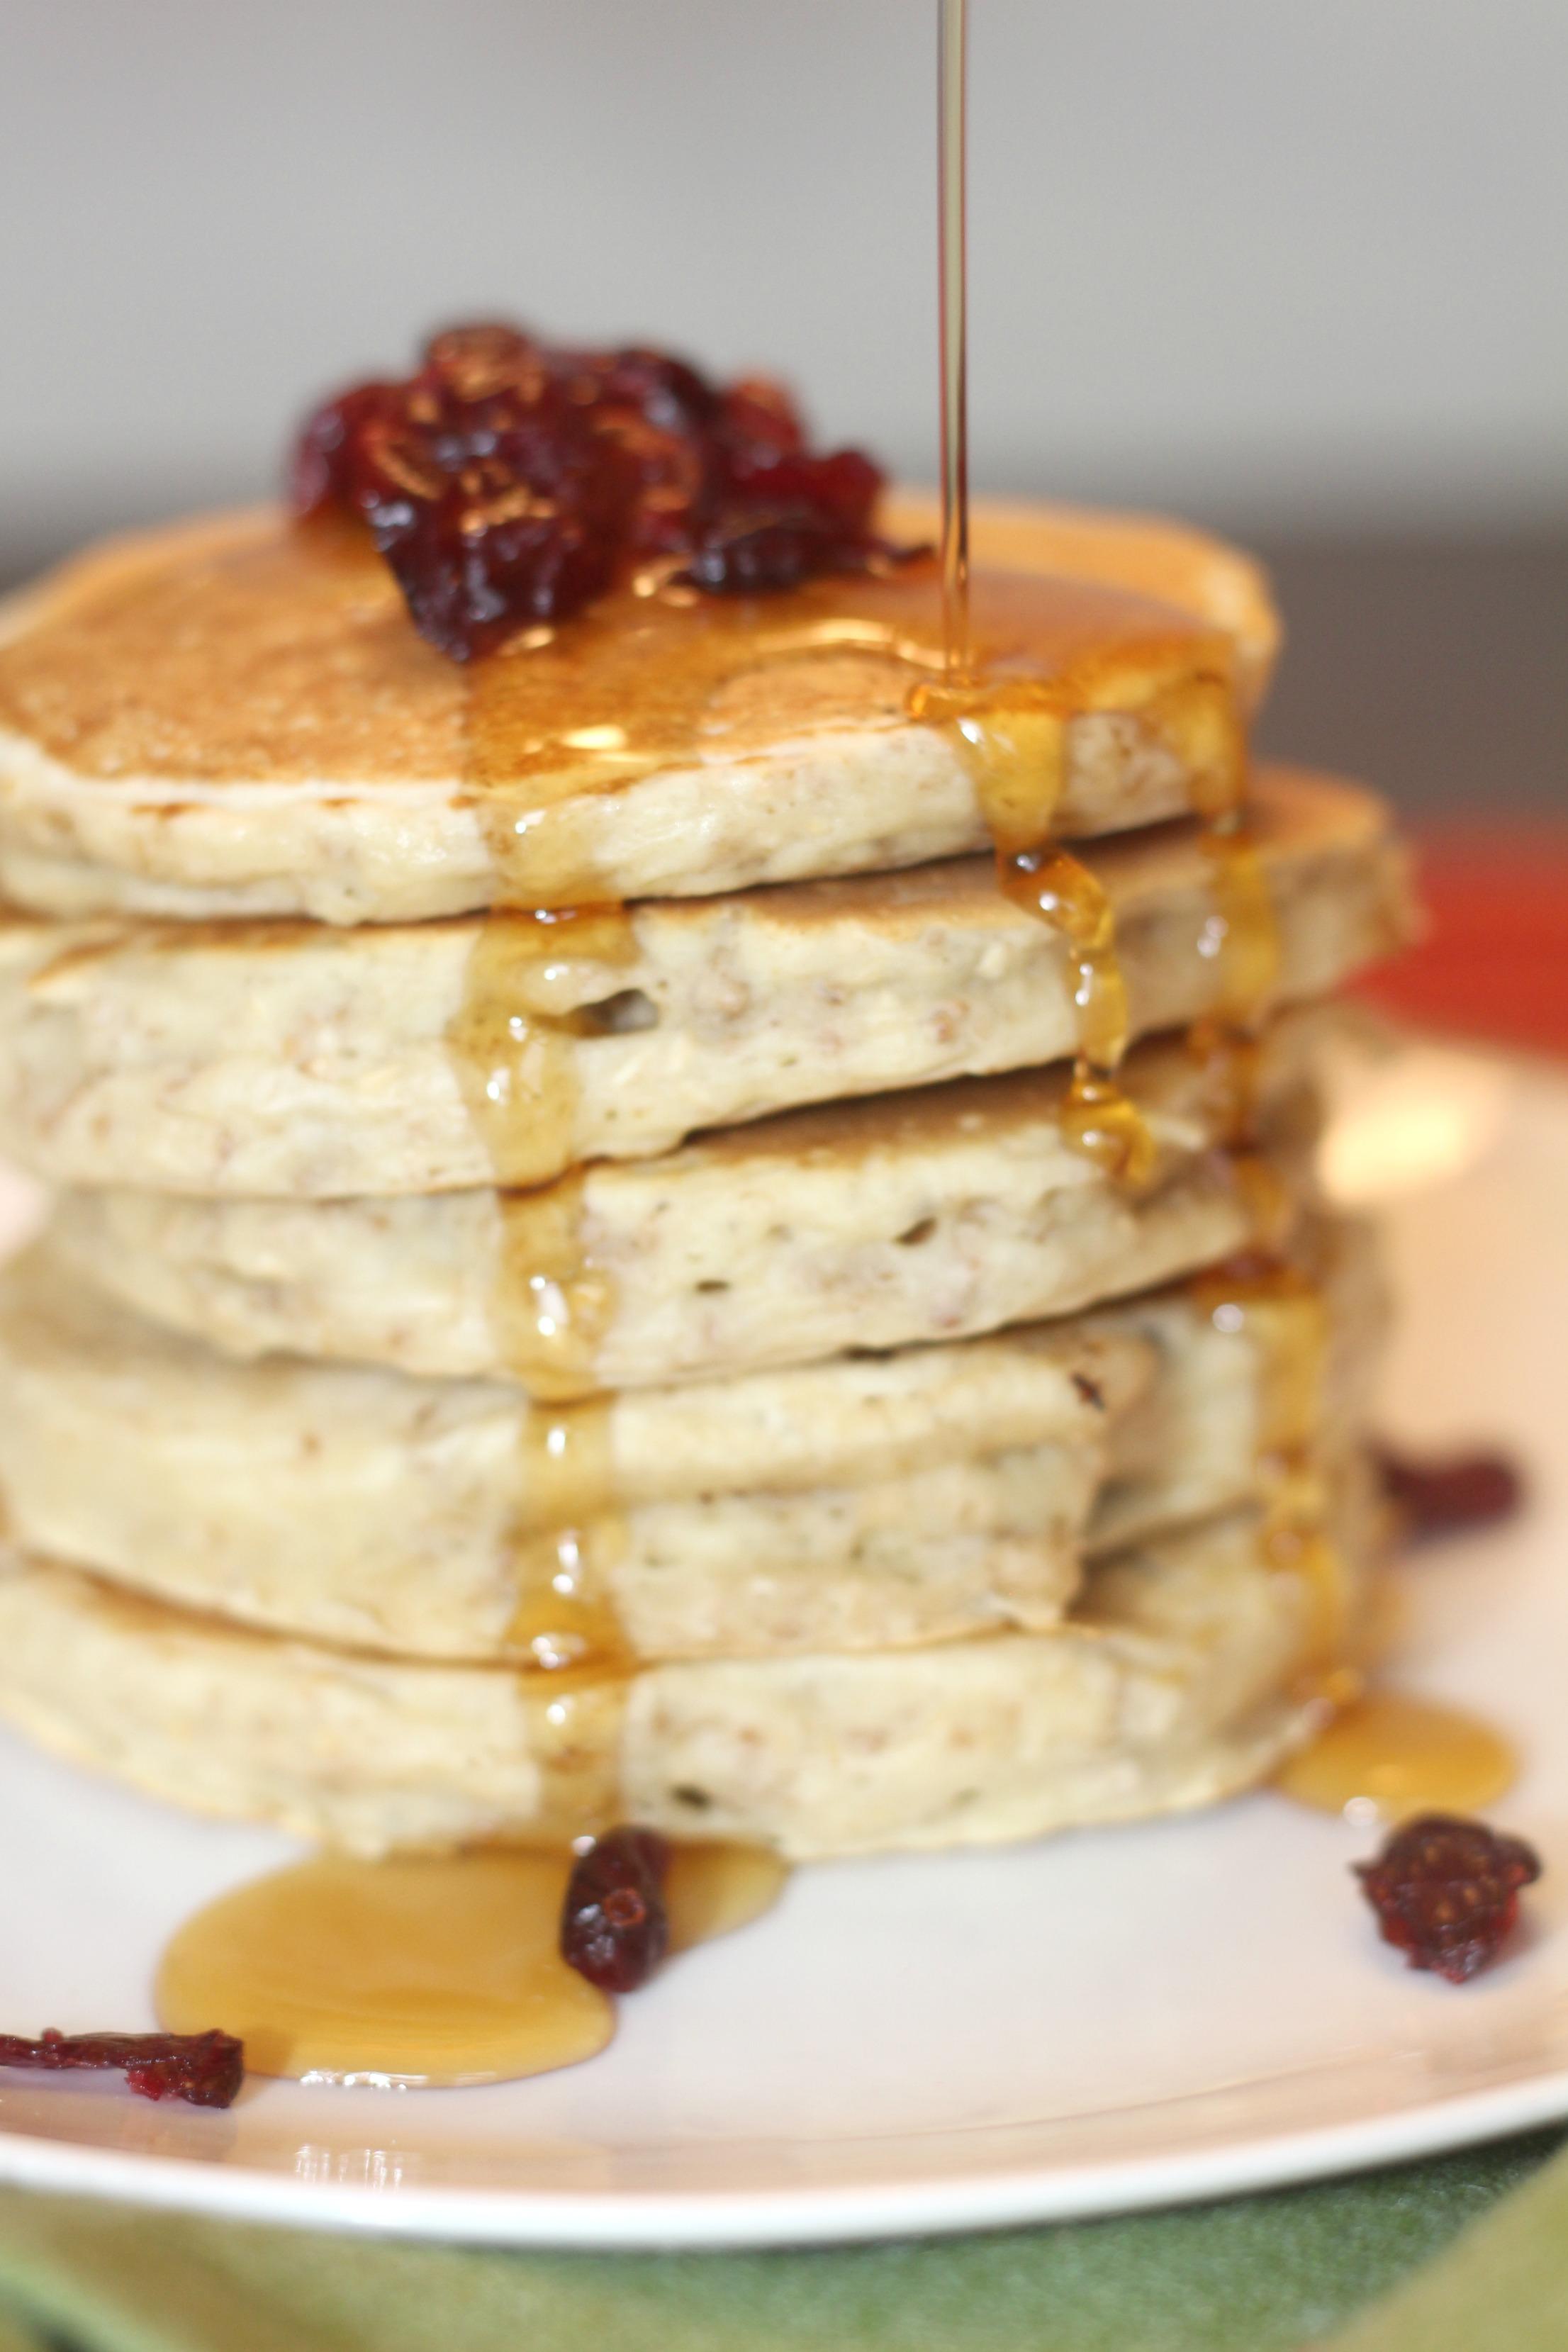 Crunchy Oatmeal Cranberry Pancake